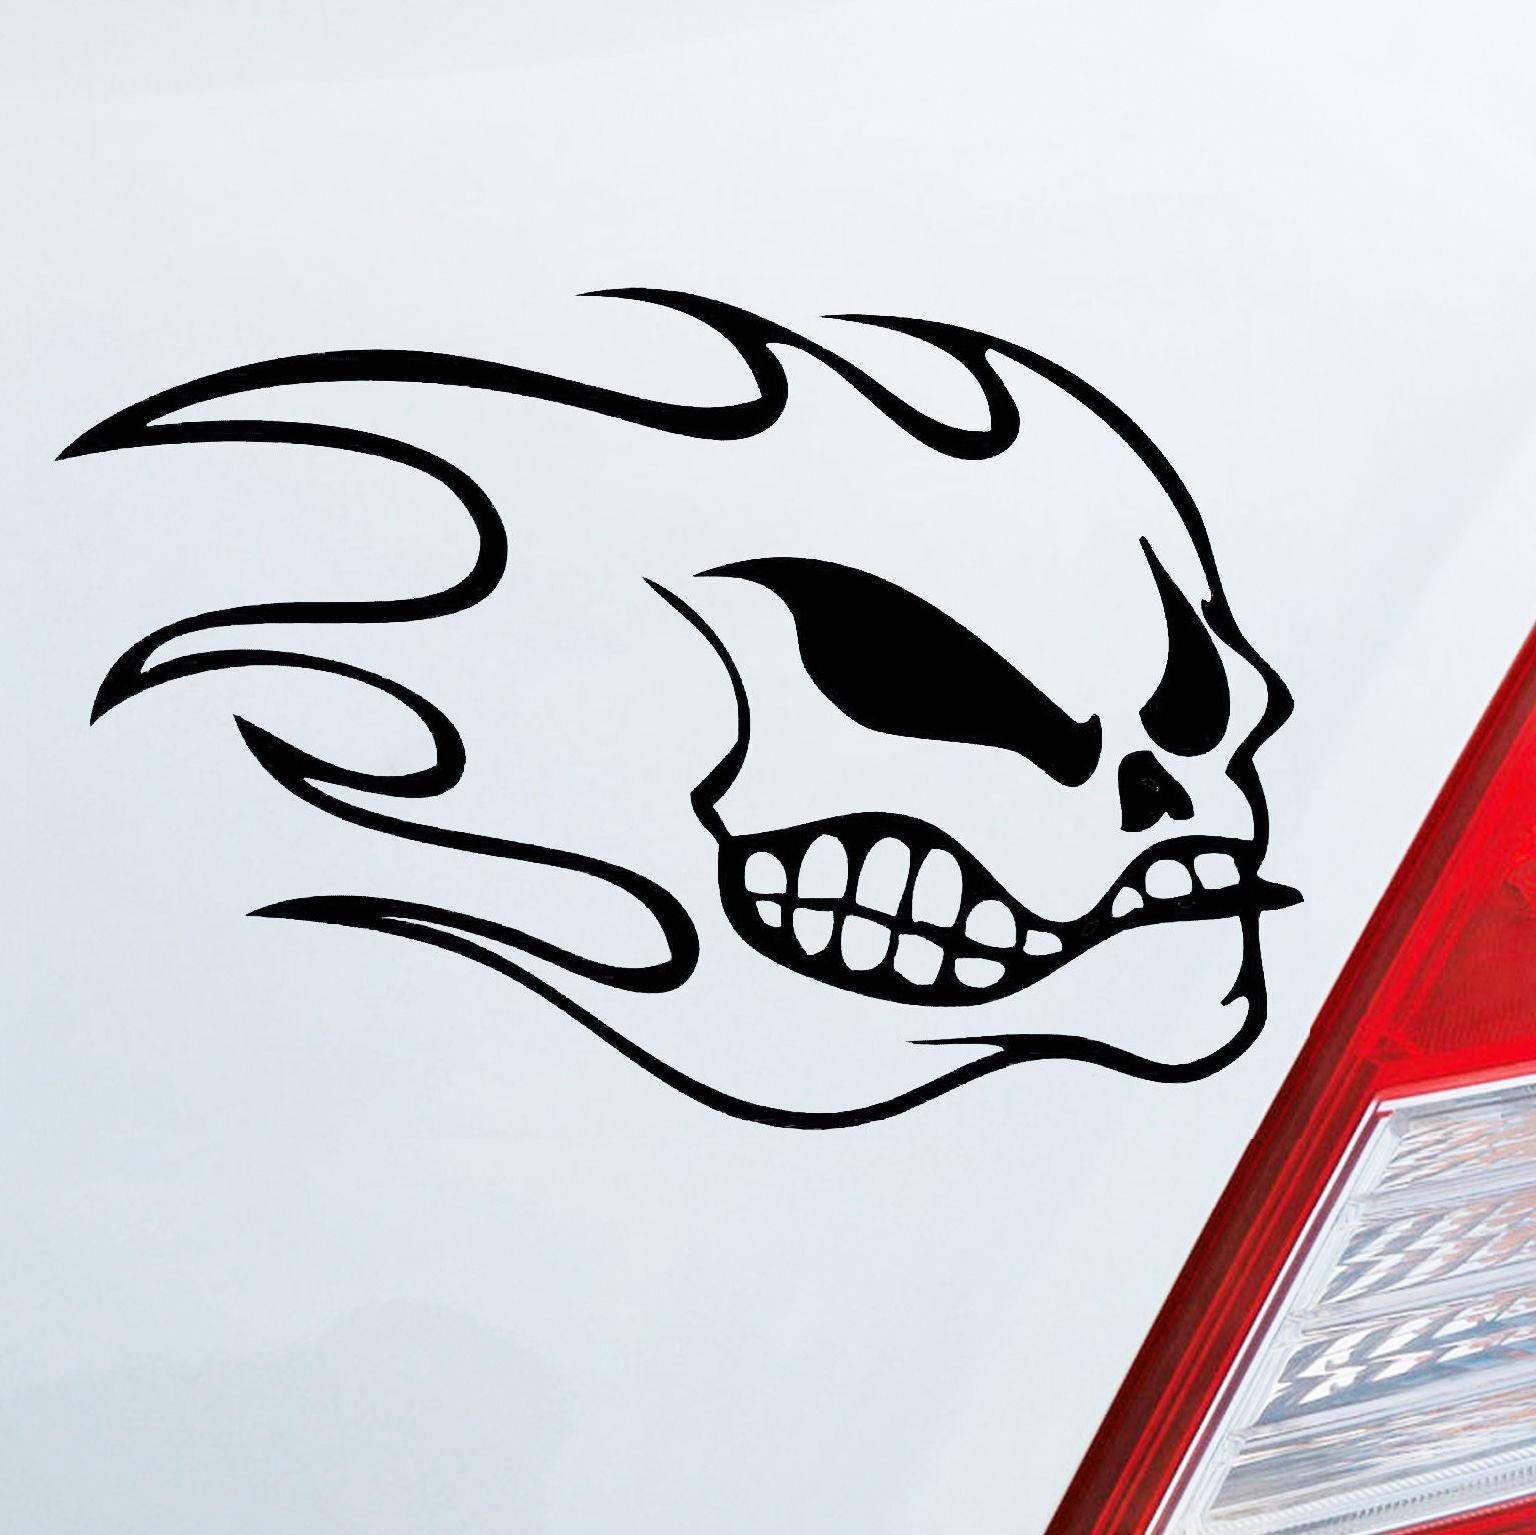 1510cm Fun Unique Totenkopf Flammen Flame Skull Aufkleber Sticker Biker Humour Delicate Vinyl Hobby Car Bumper Sticker